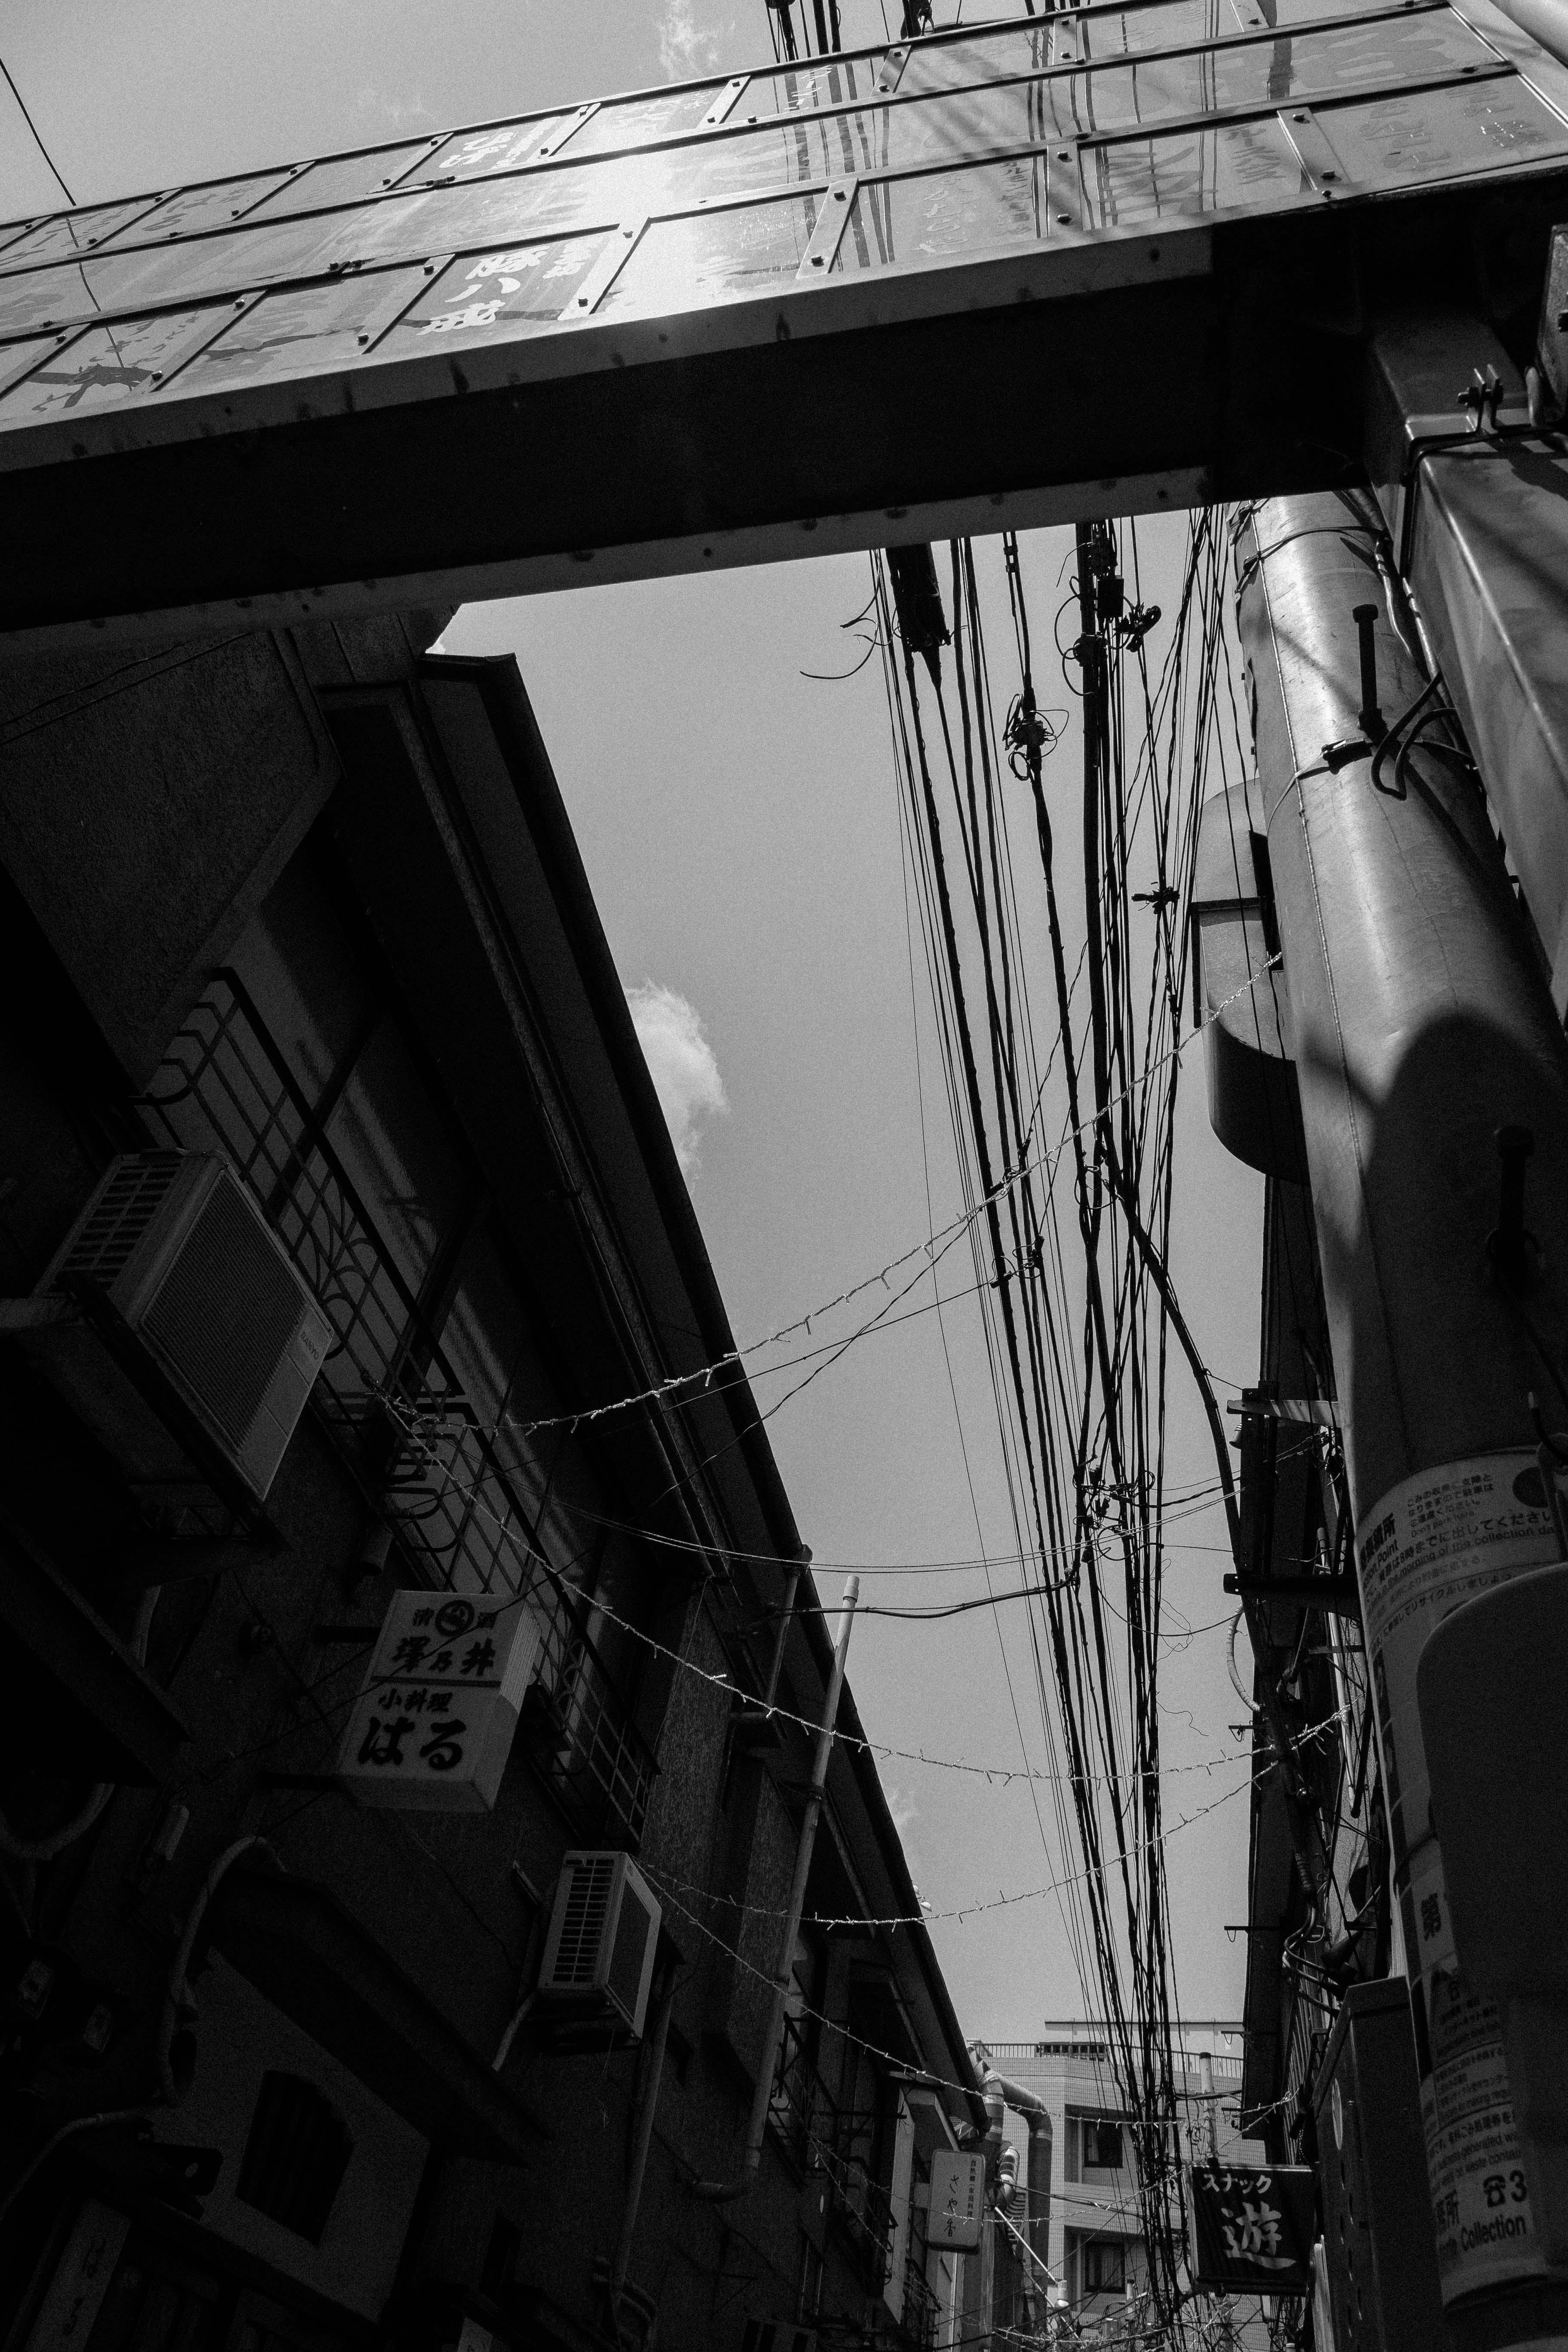 阿佐ヶ谷散策(8)